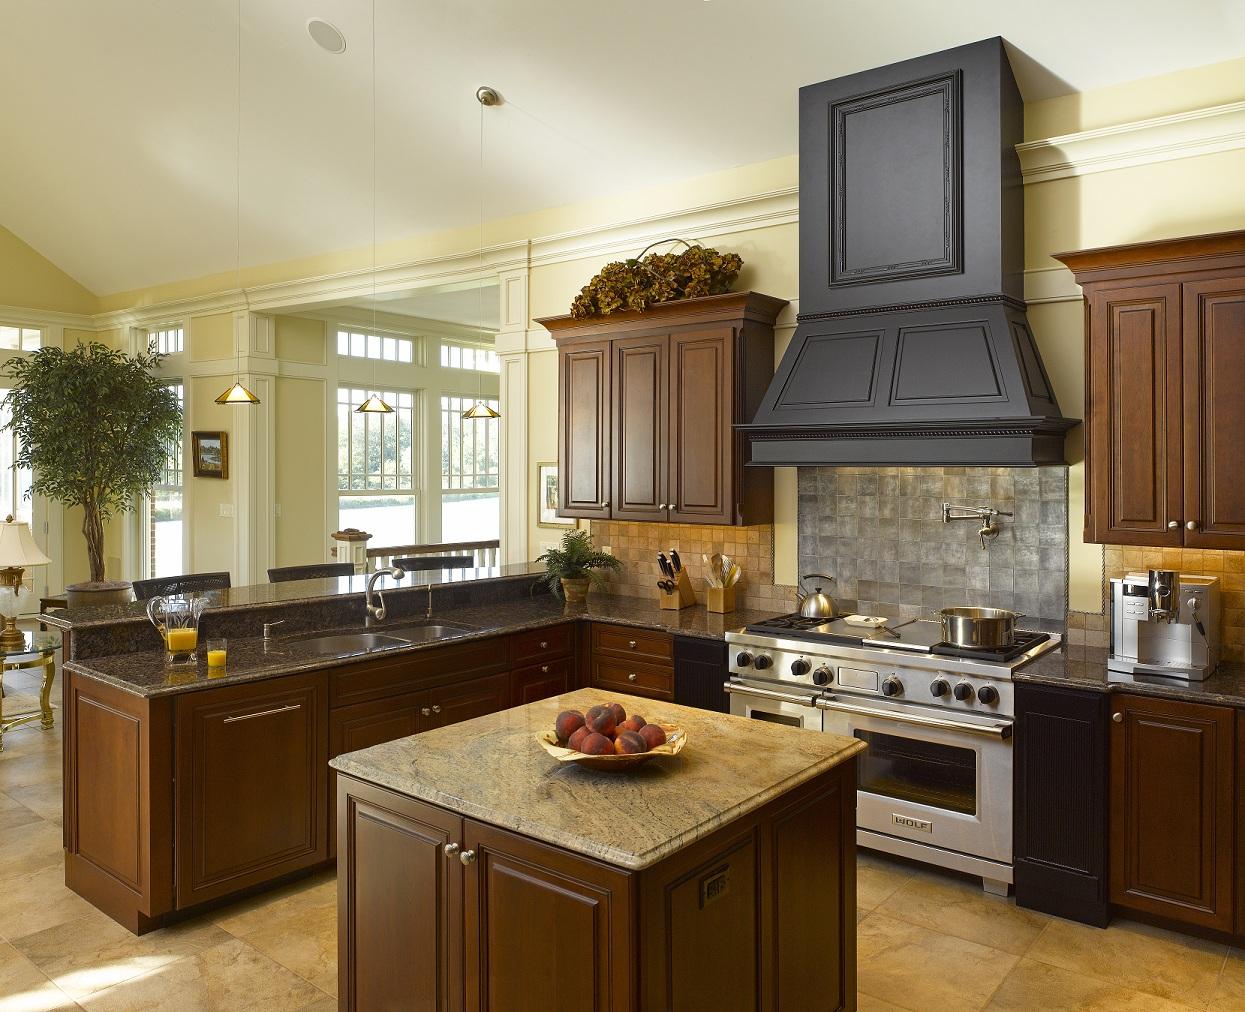 Mouser Kitchen and Bath Cabinets | Newnan | Kitchen ...